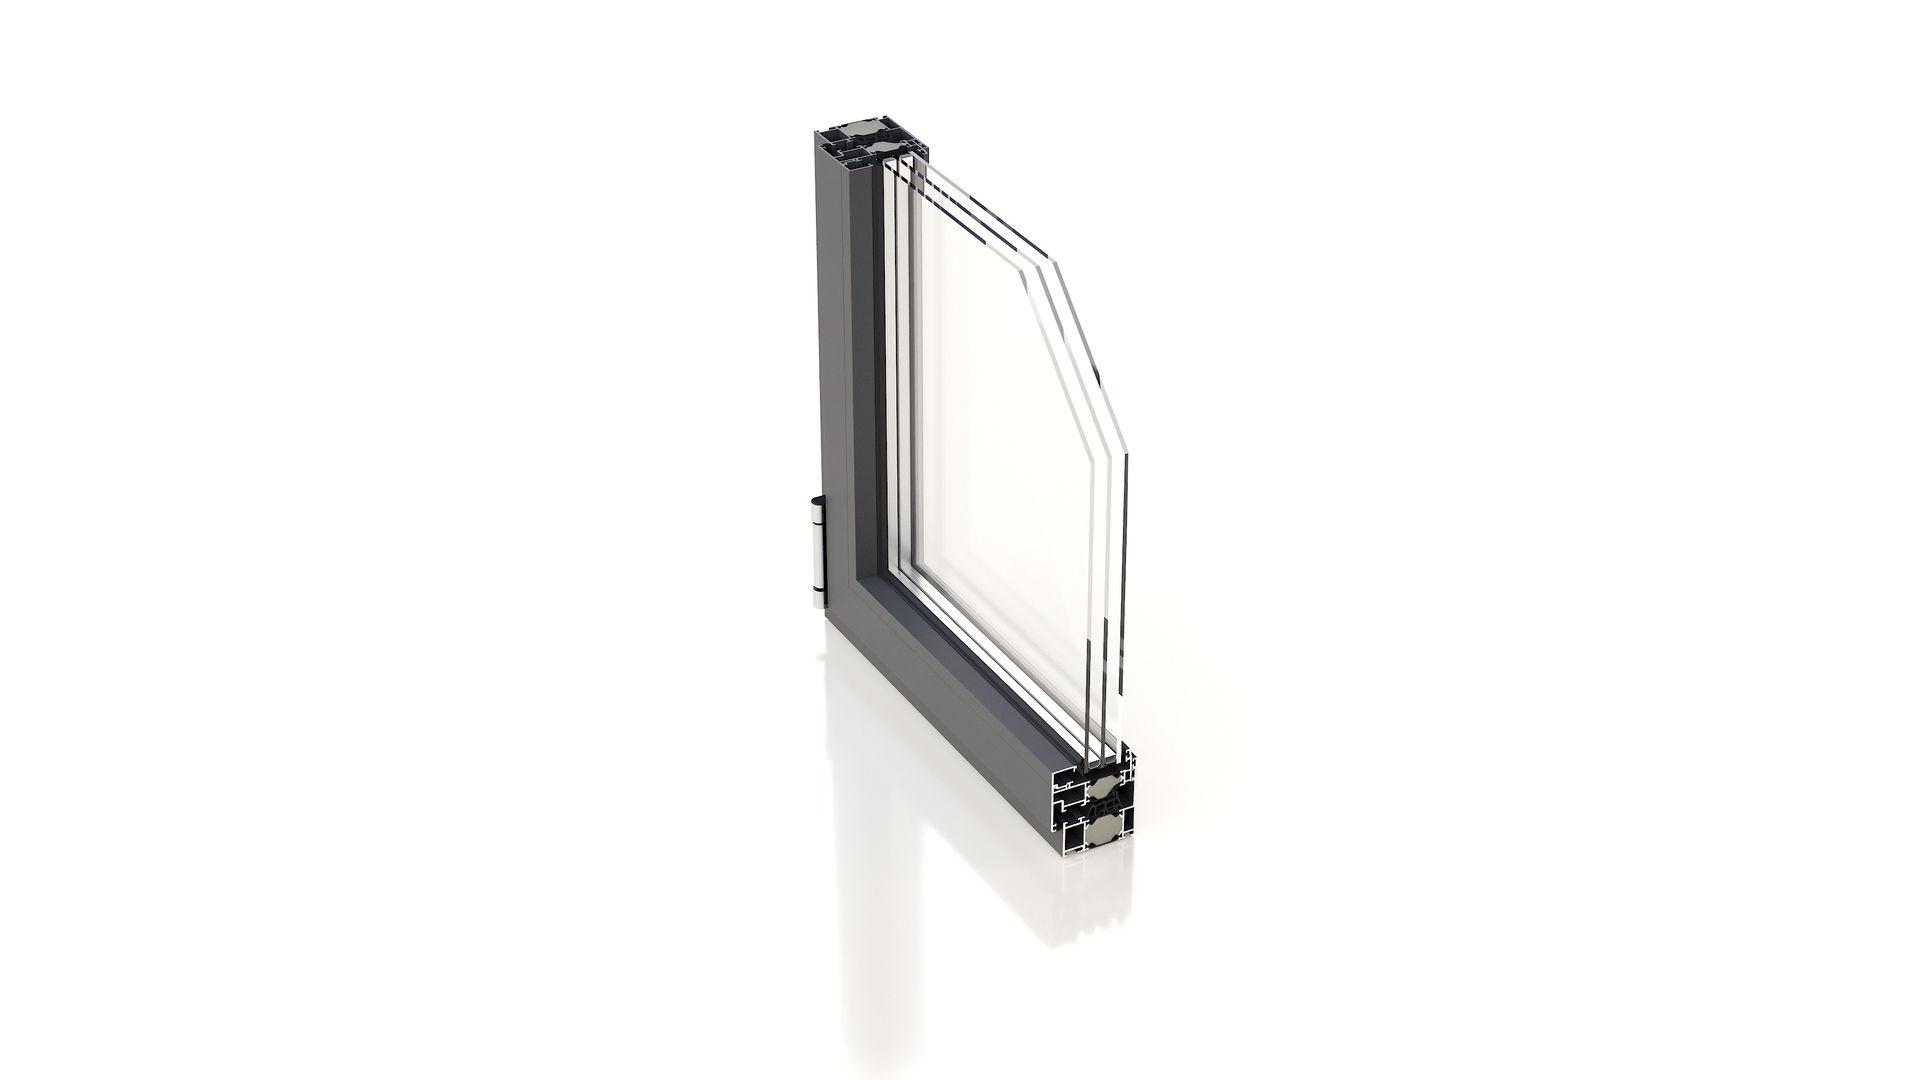 Aluminium Fenster Profil heroal w72i